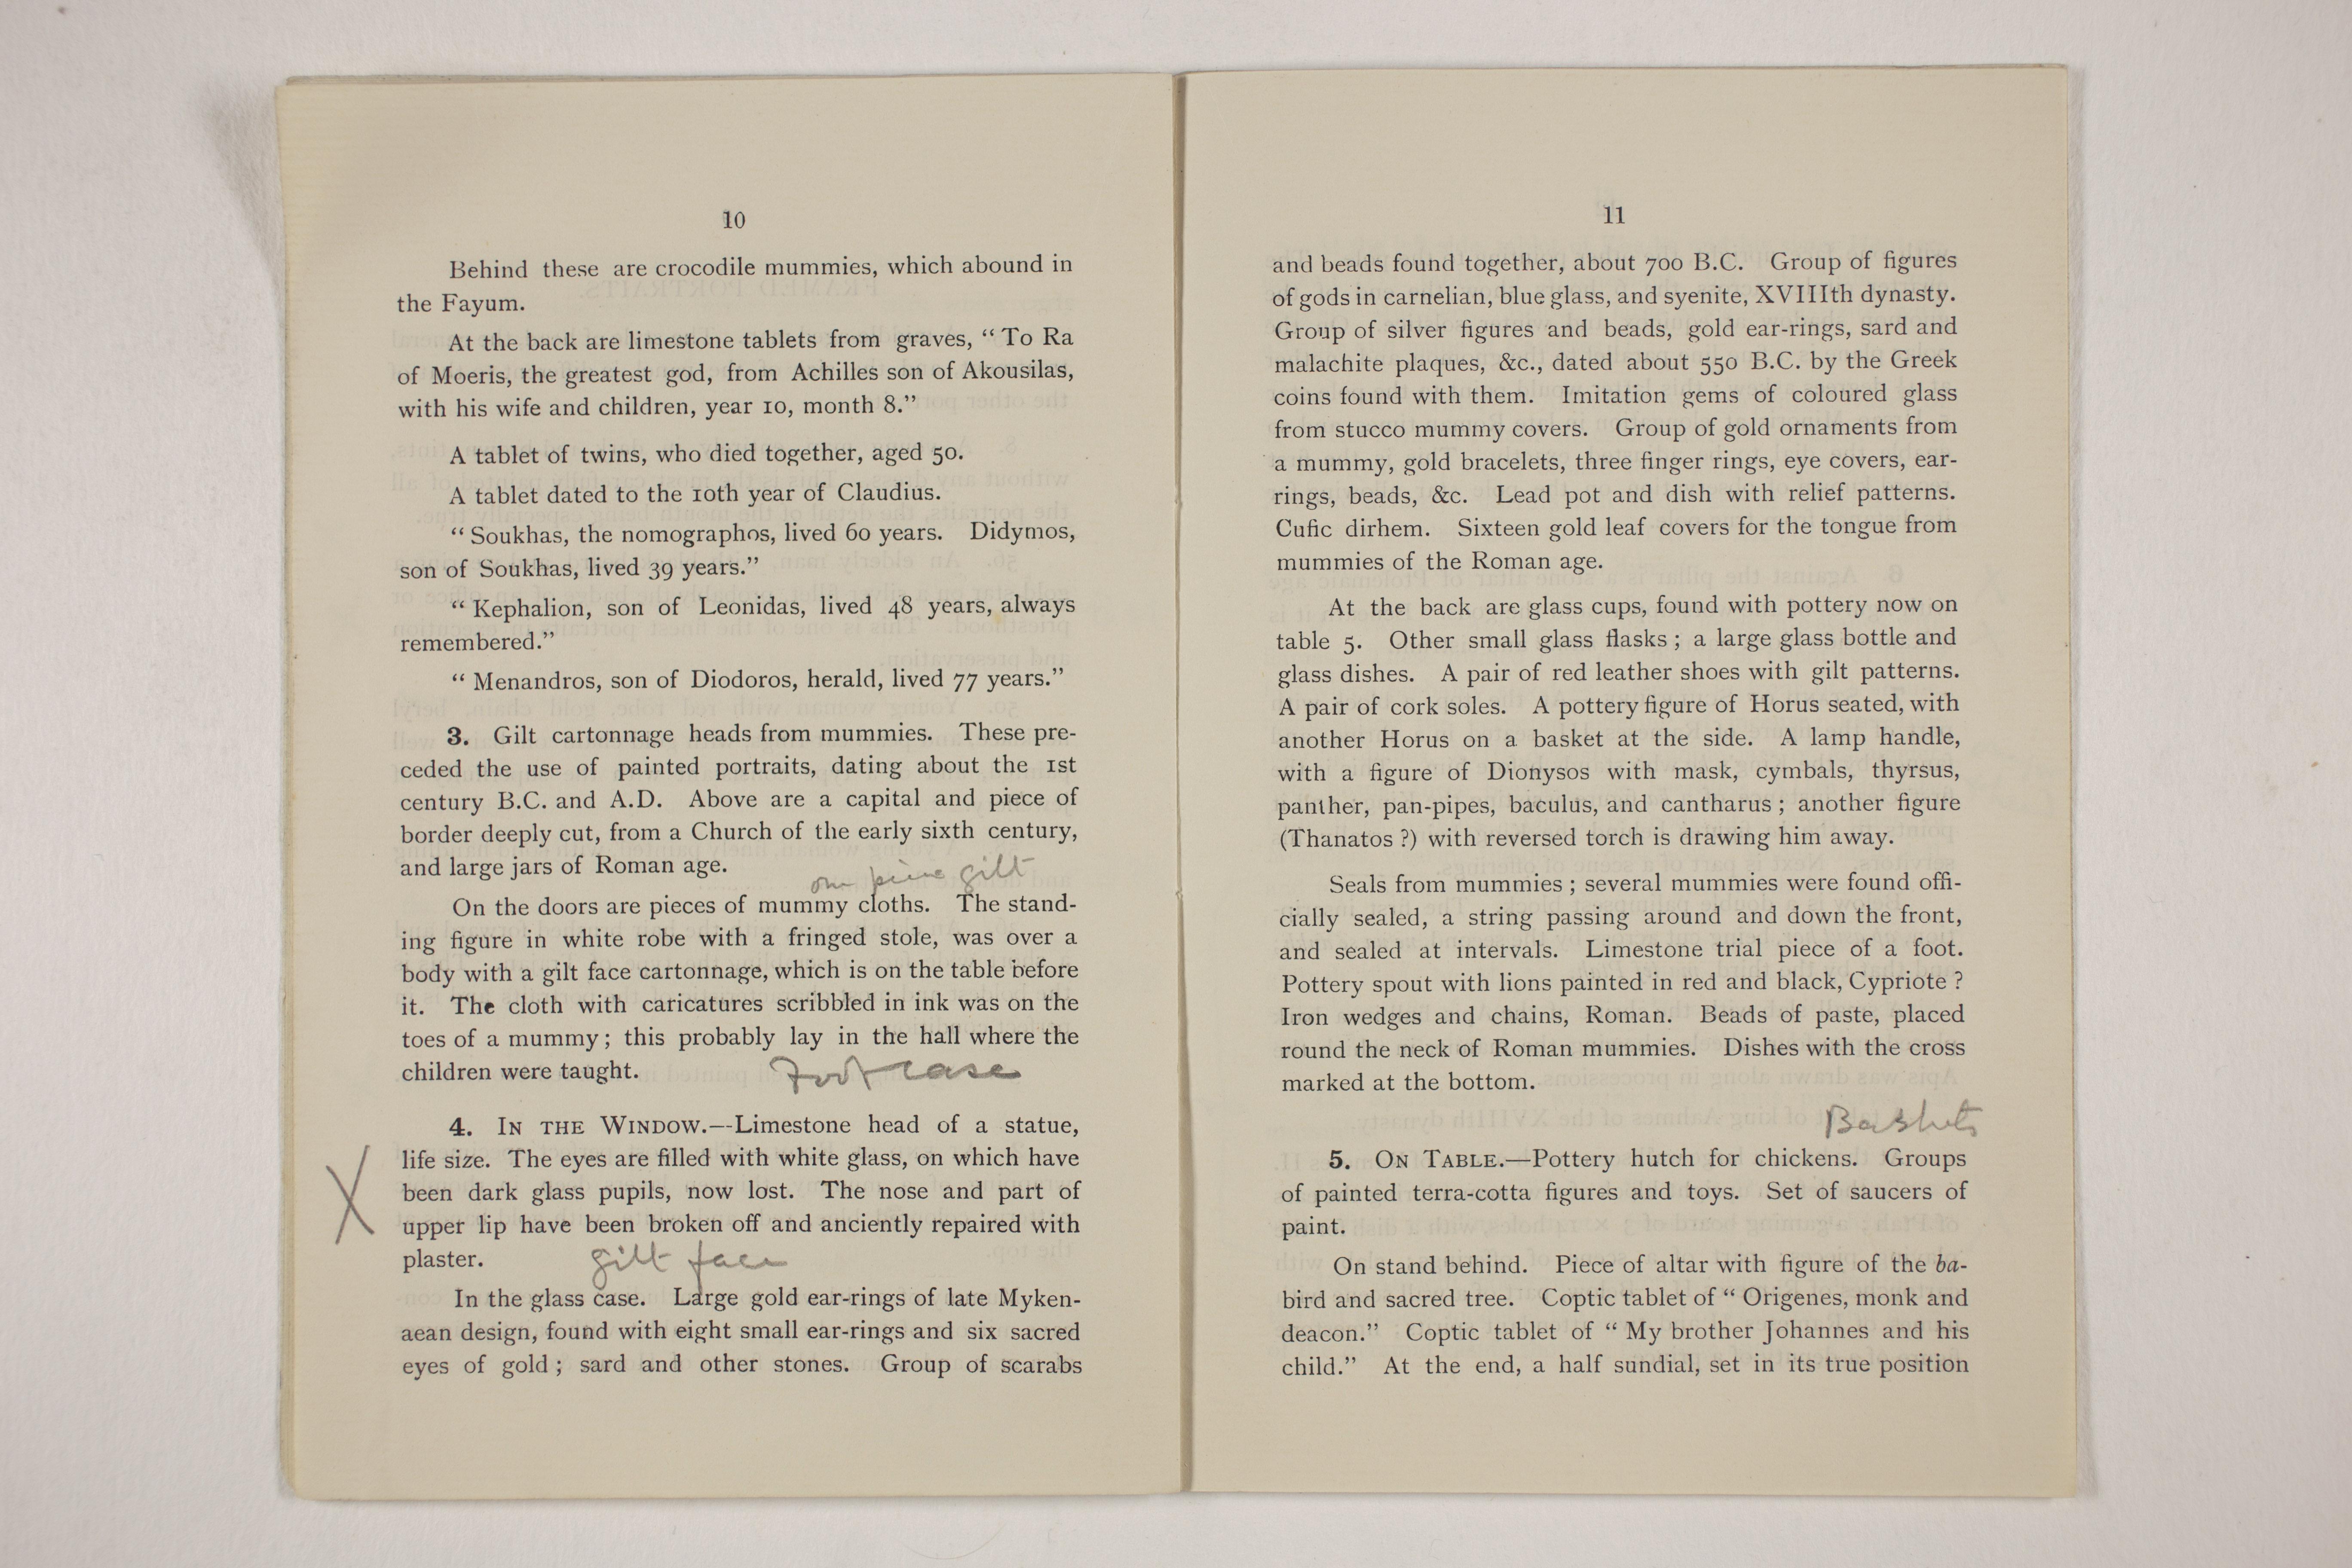 1910-11 Hawara, Gerzeh, Memphis, Mazghuneh Exhibition catalogue PMA/WFP1/D/19/33.7